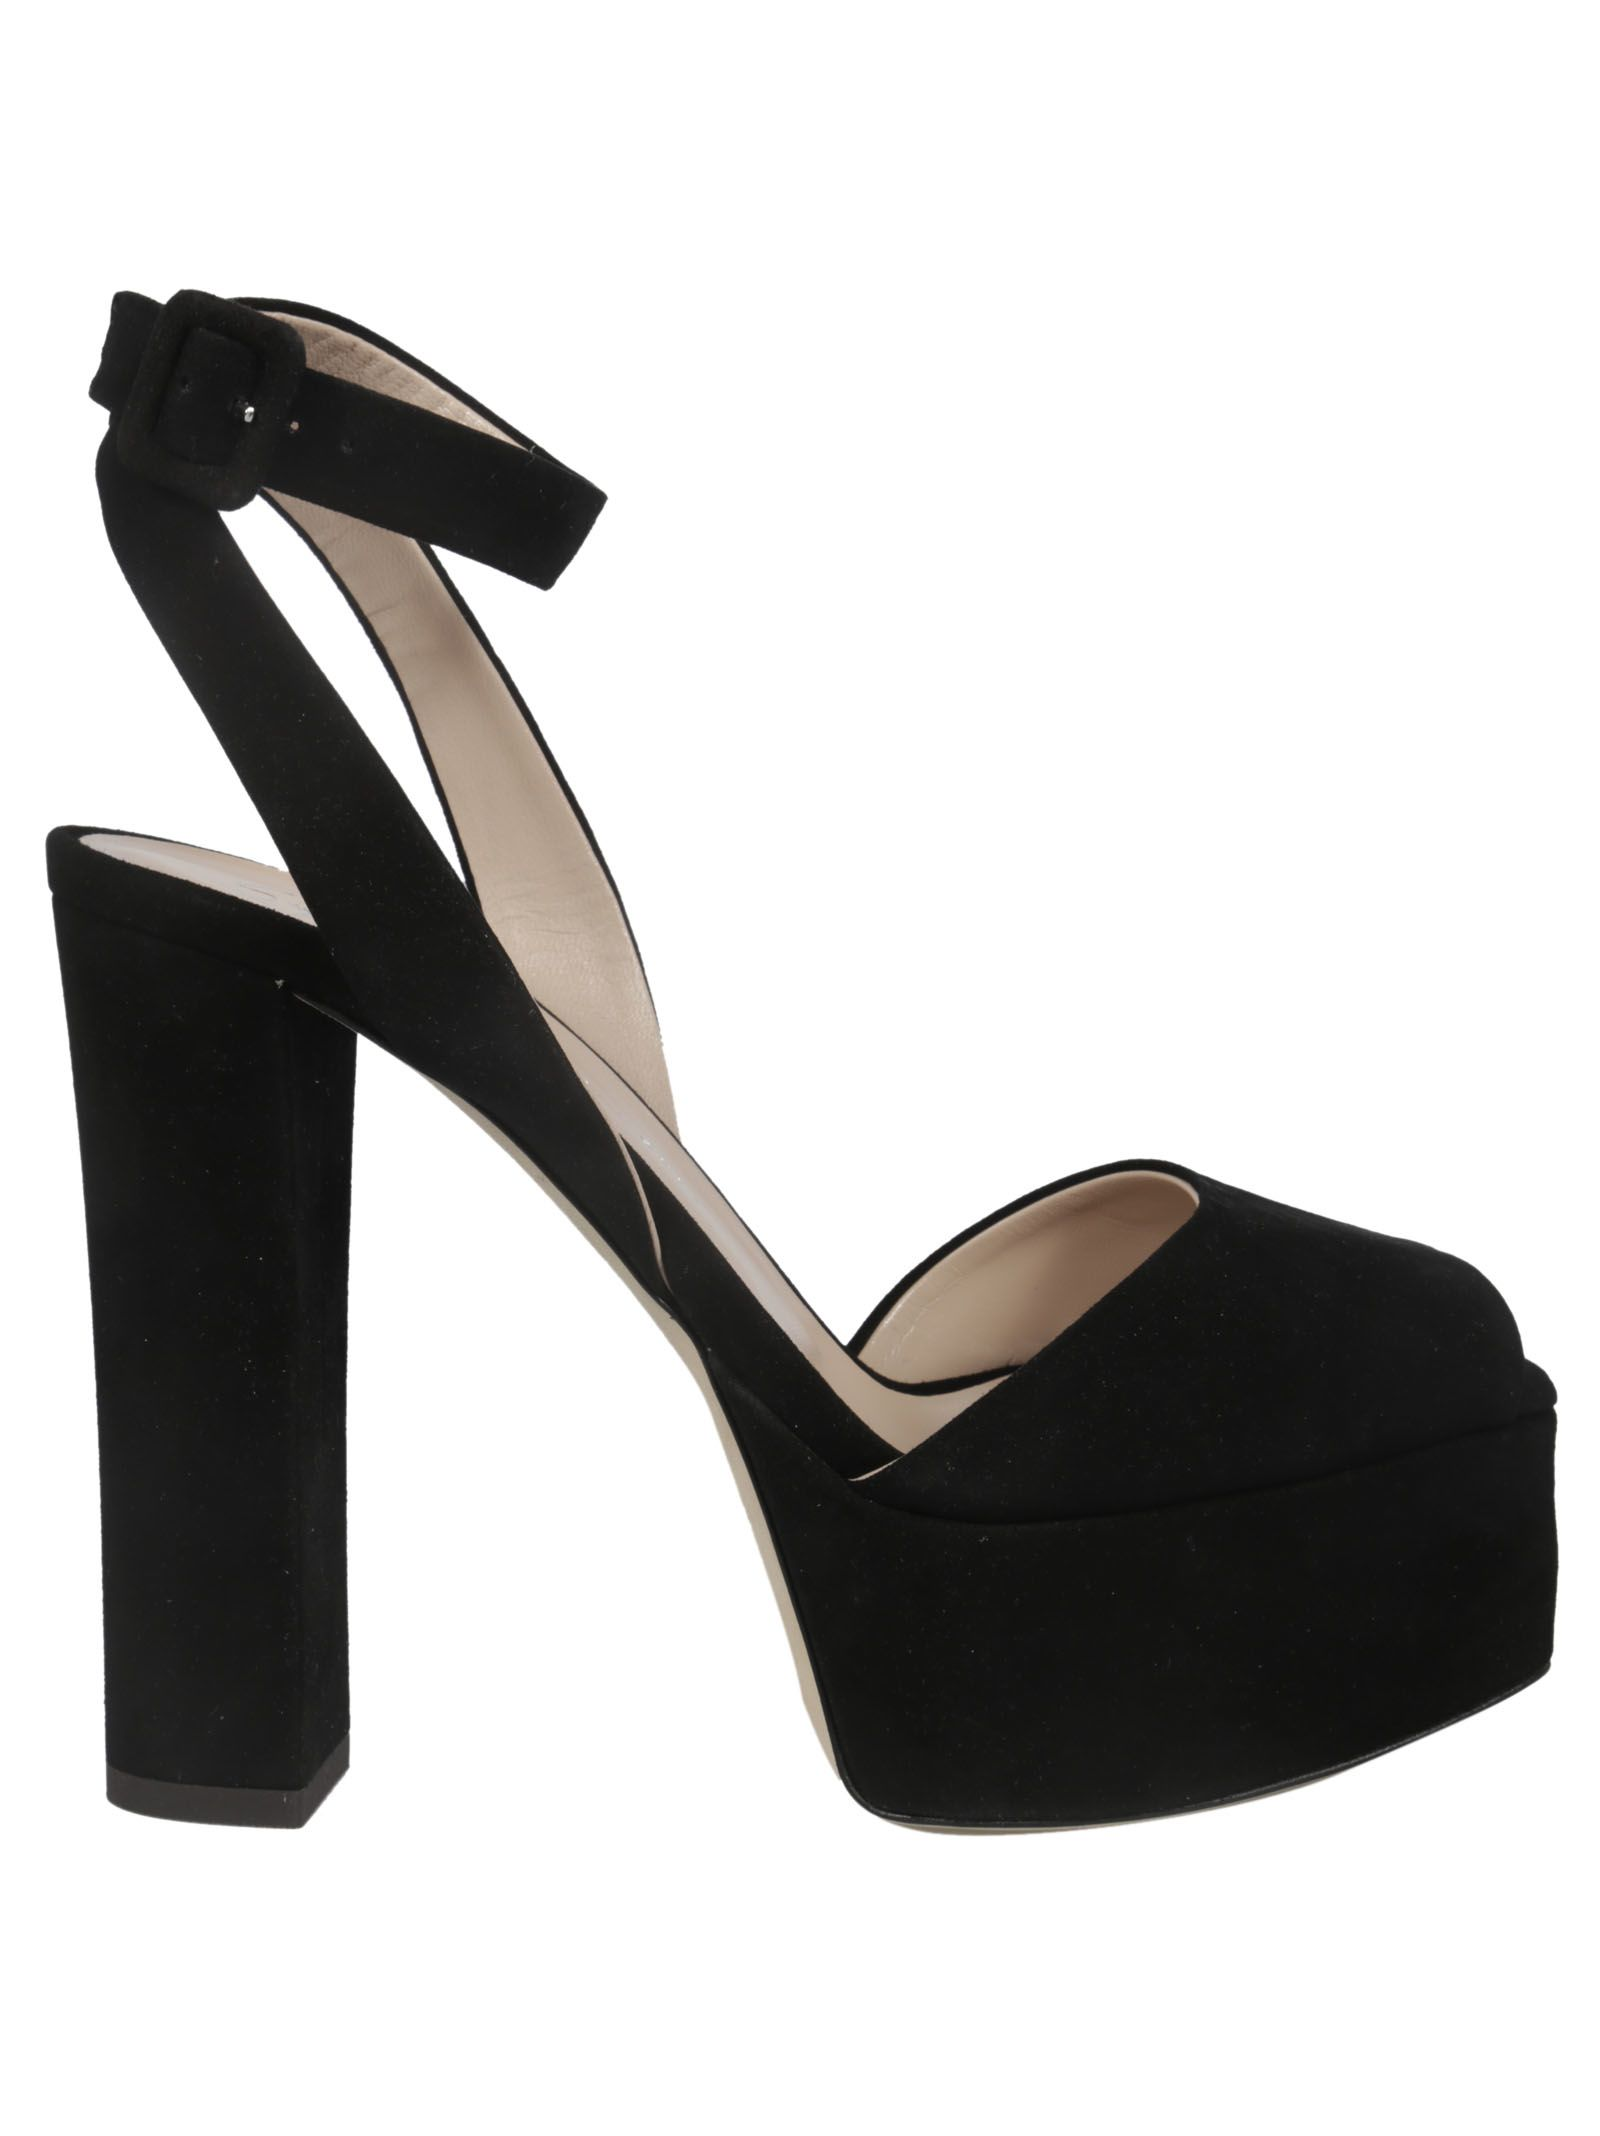 1a9195353b293 Giuseppe Zanotti Giuseppe Zanotti Betty Platform Sandals - Black ...